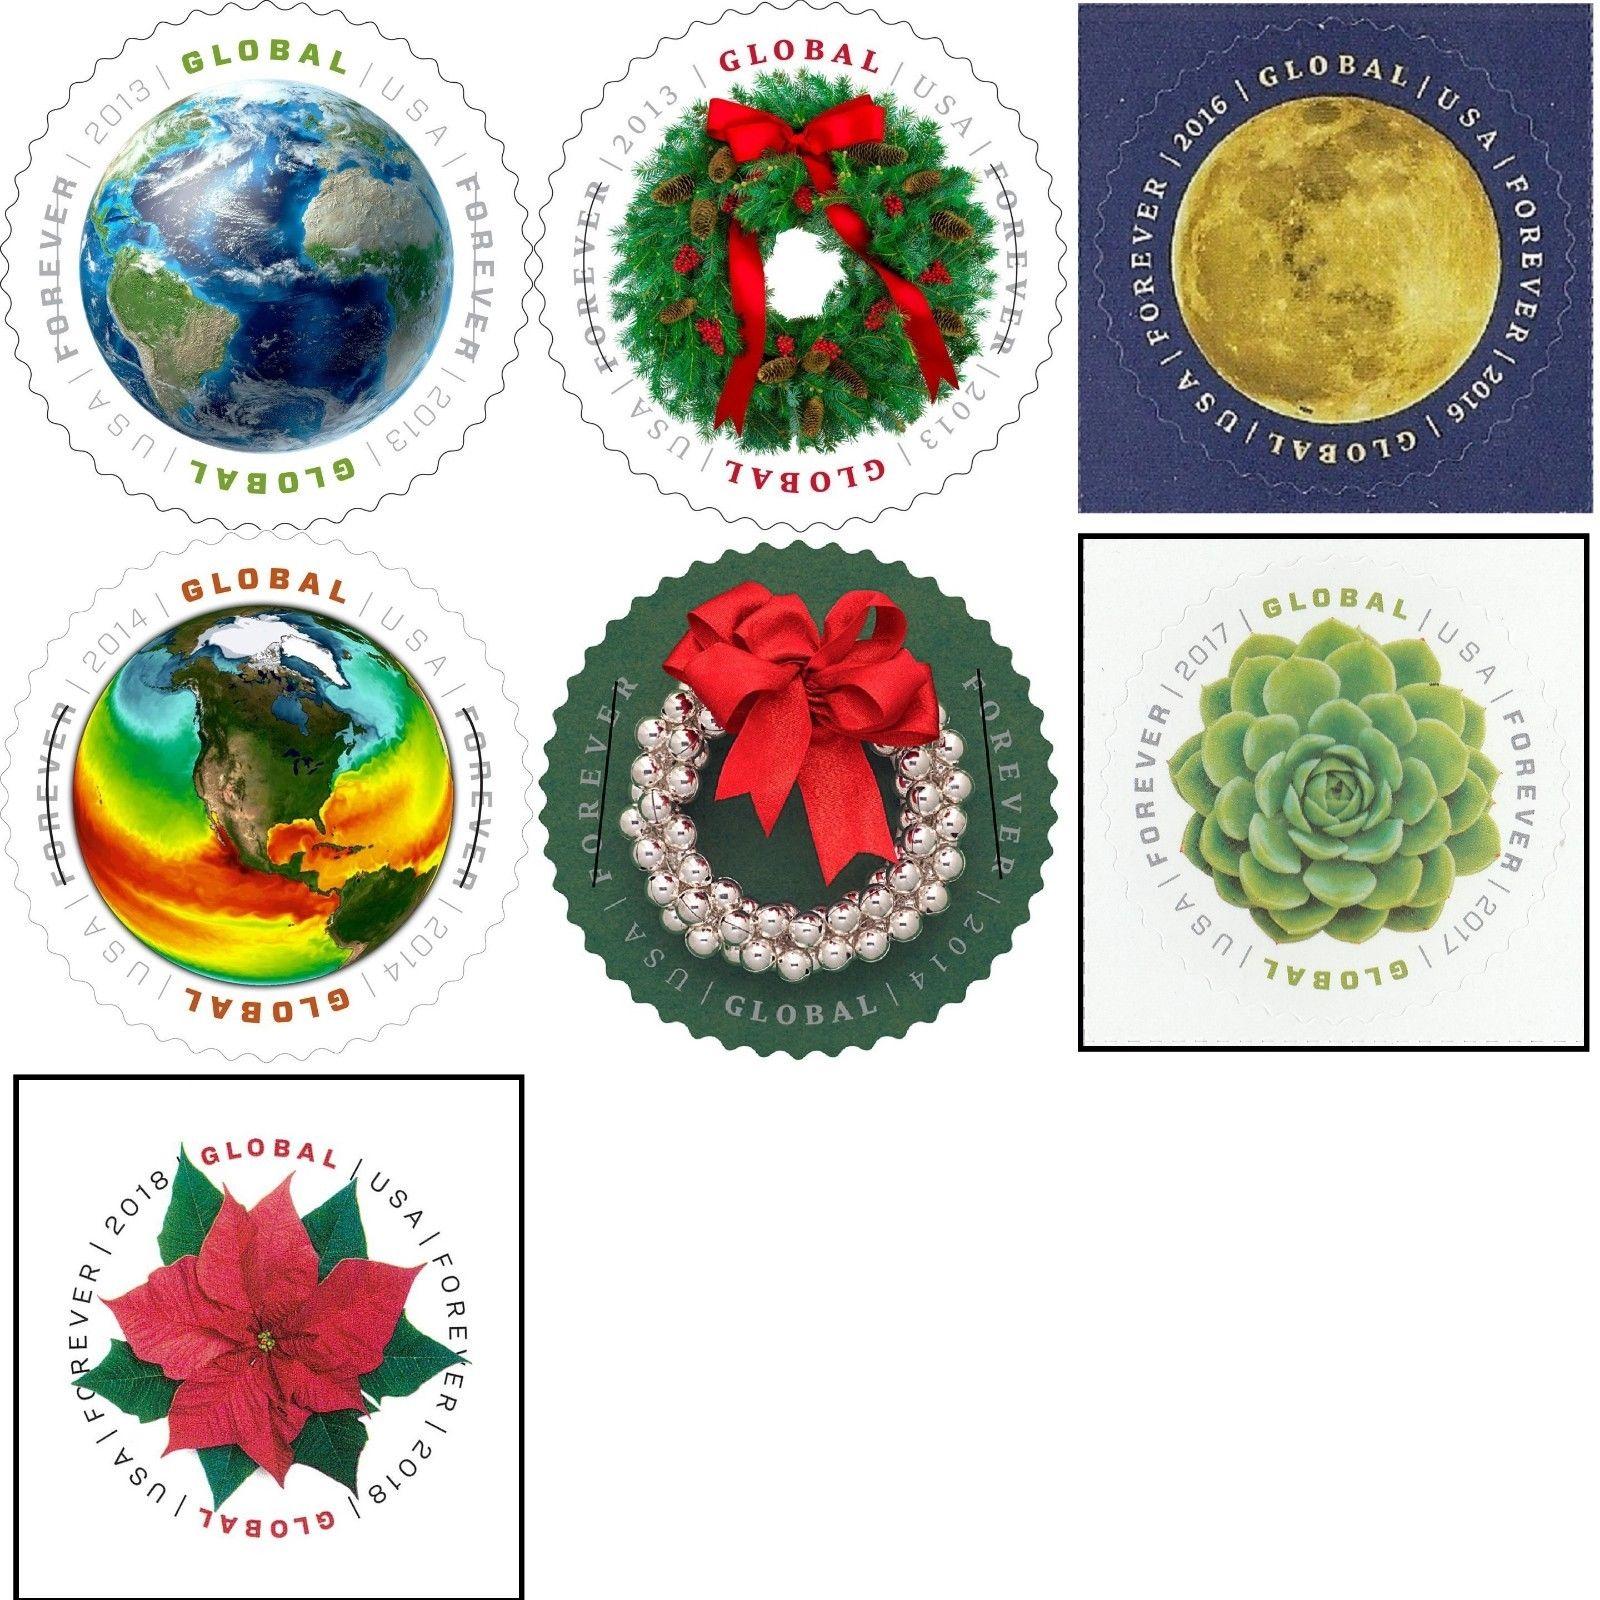 Us 4740 4814 4893 4936 5058 5198 5311 Poinsettia Global